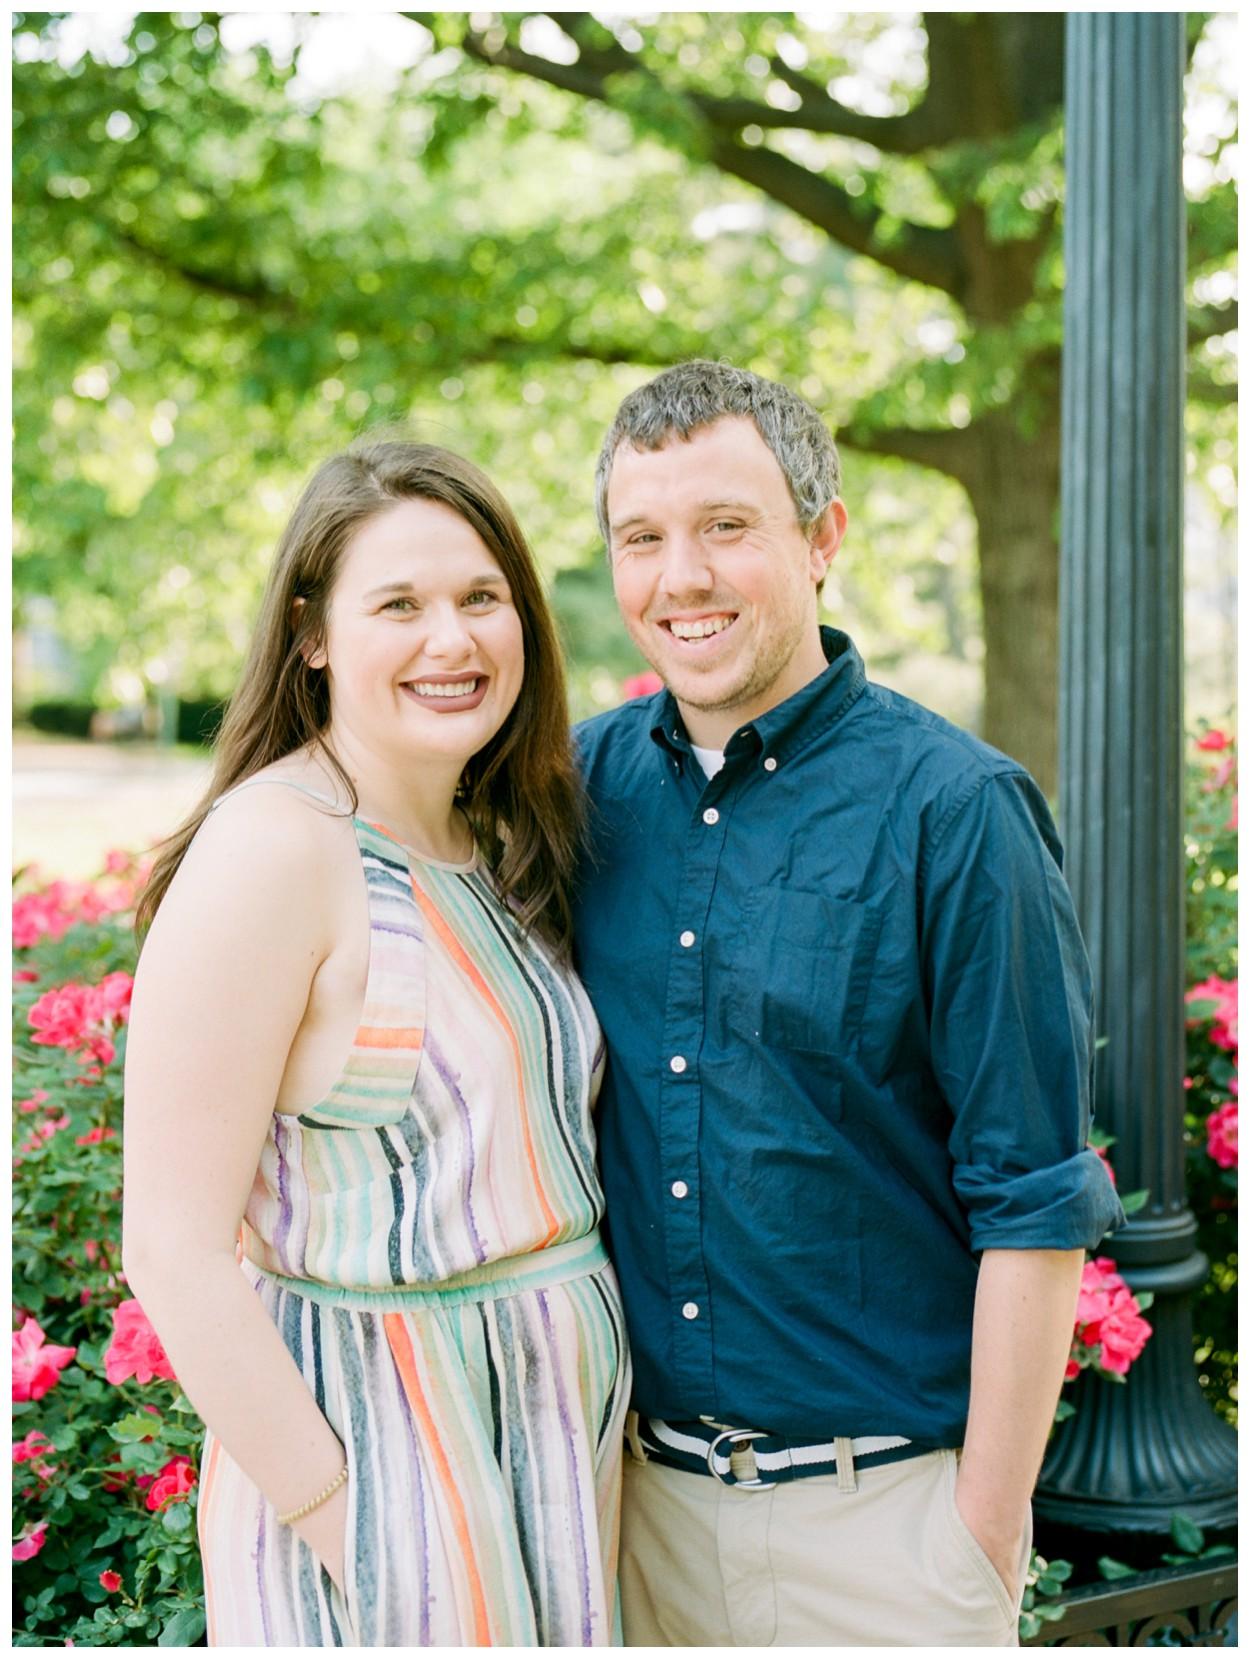 Summer Engagement Session in Adams Morgan, Washington DC by fine art wedding photographer Lissa Ryan Photography